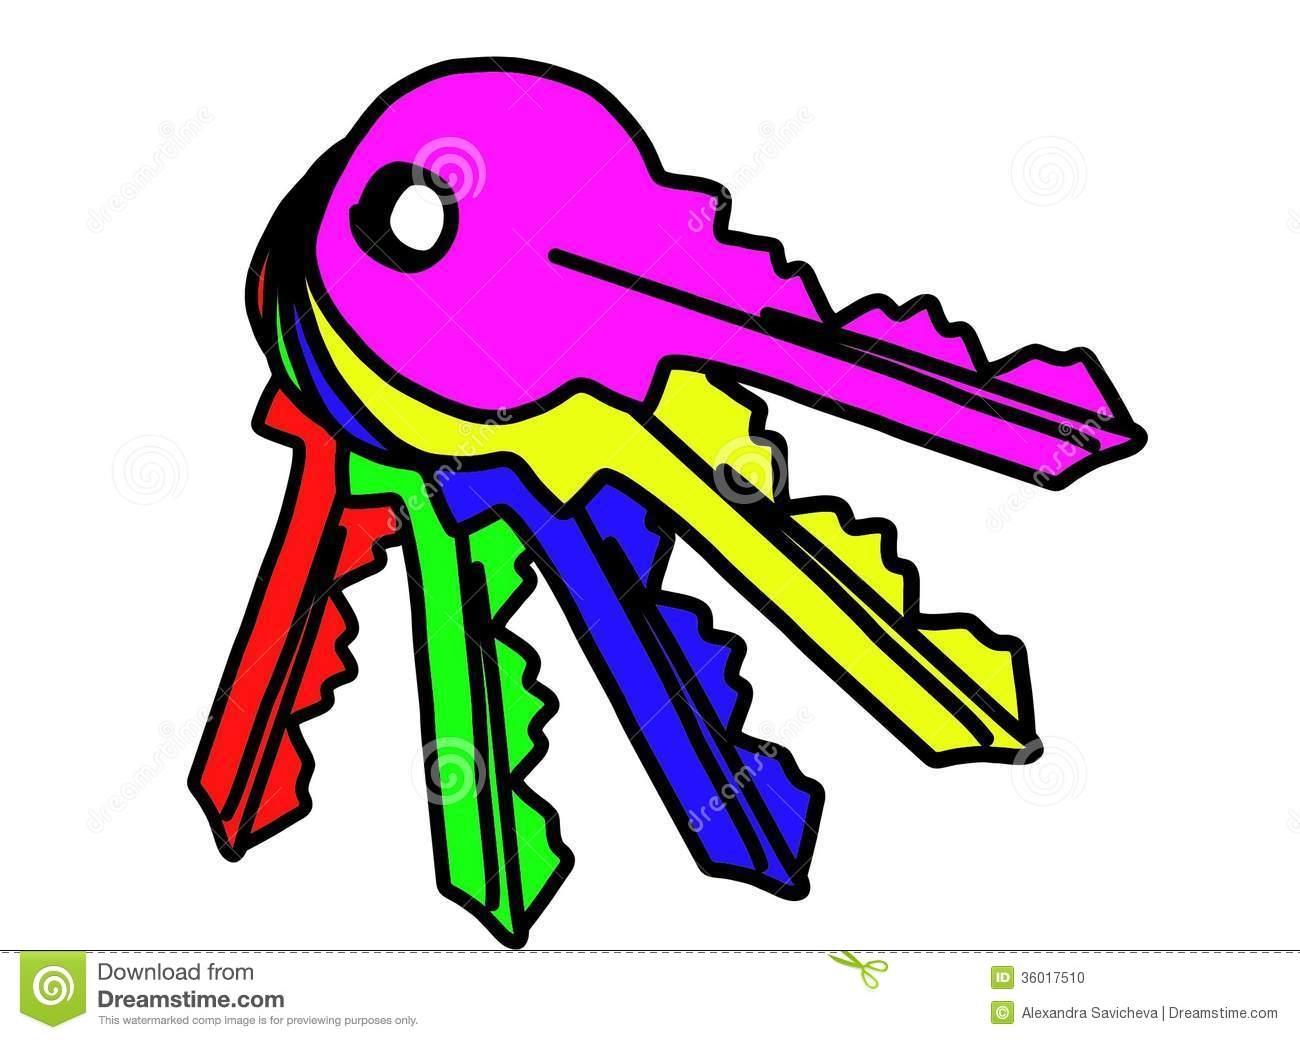 Keys clipart. Unique gallery digital collection